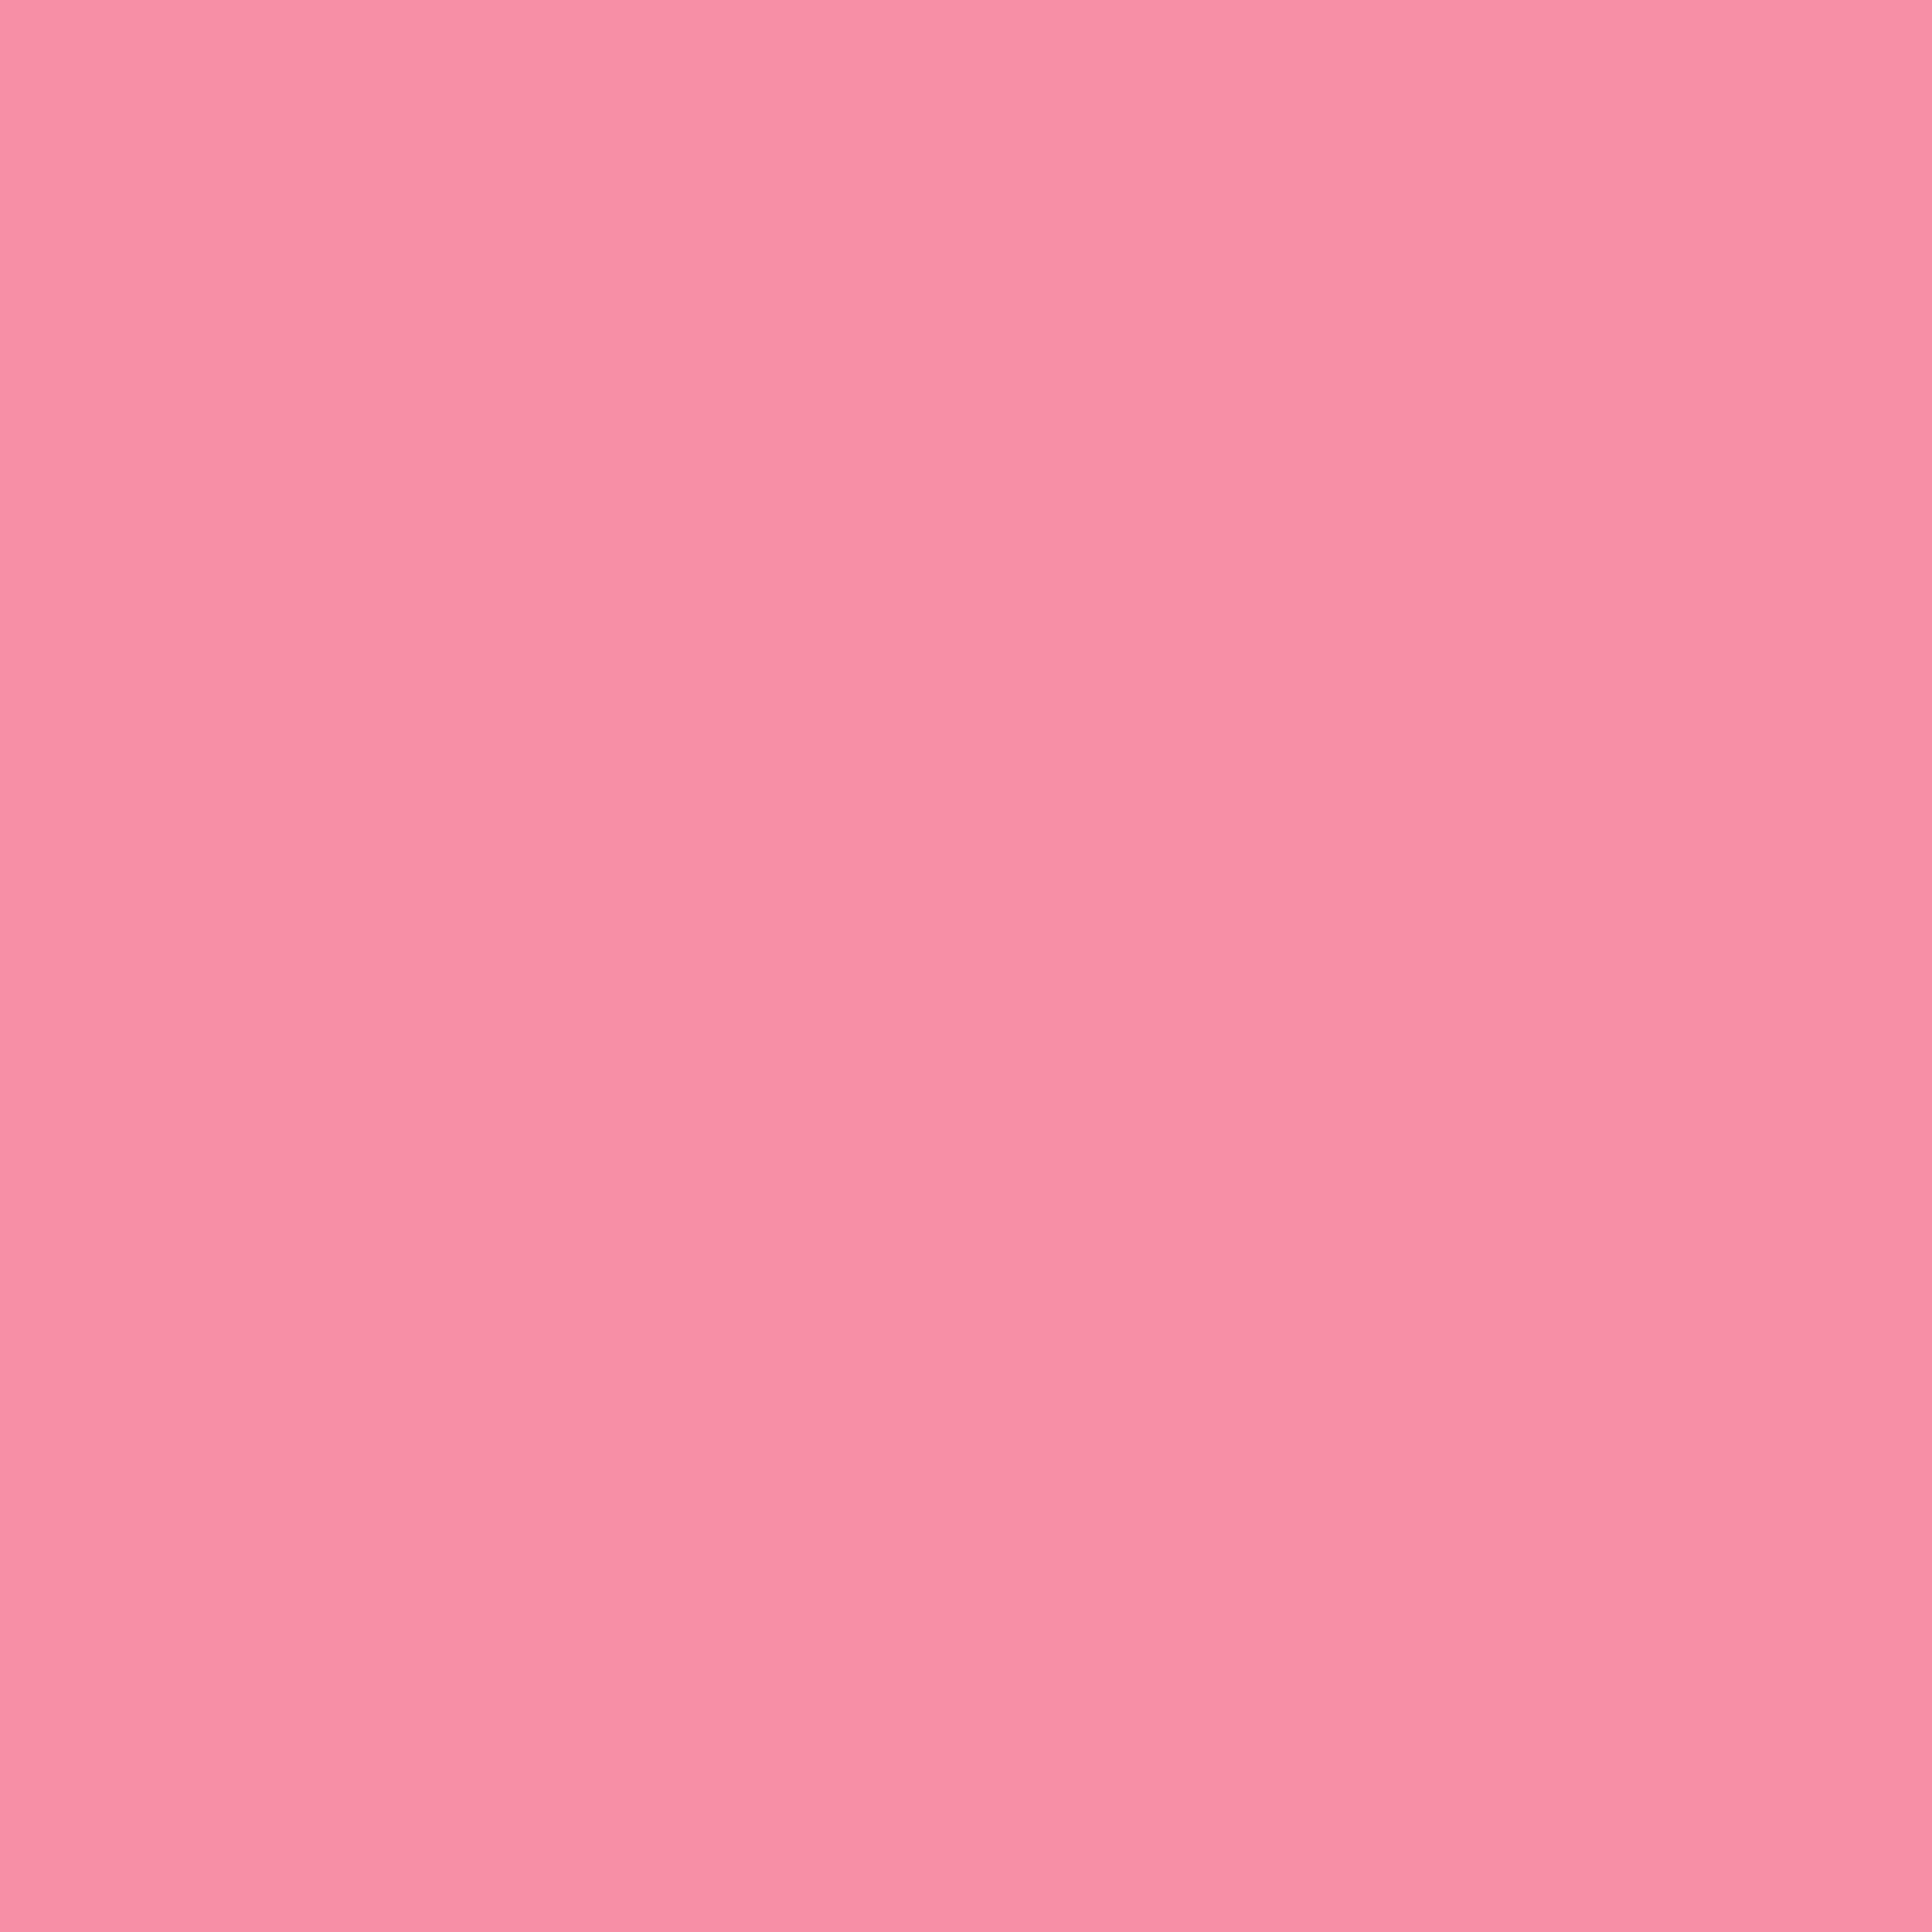 2732x2732 Pink Sherbet Solid Color Background